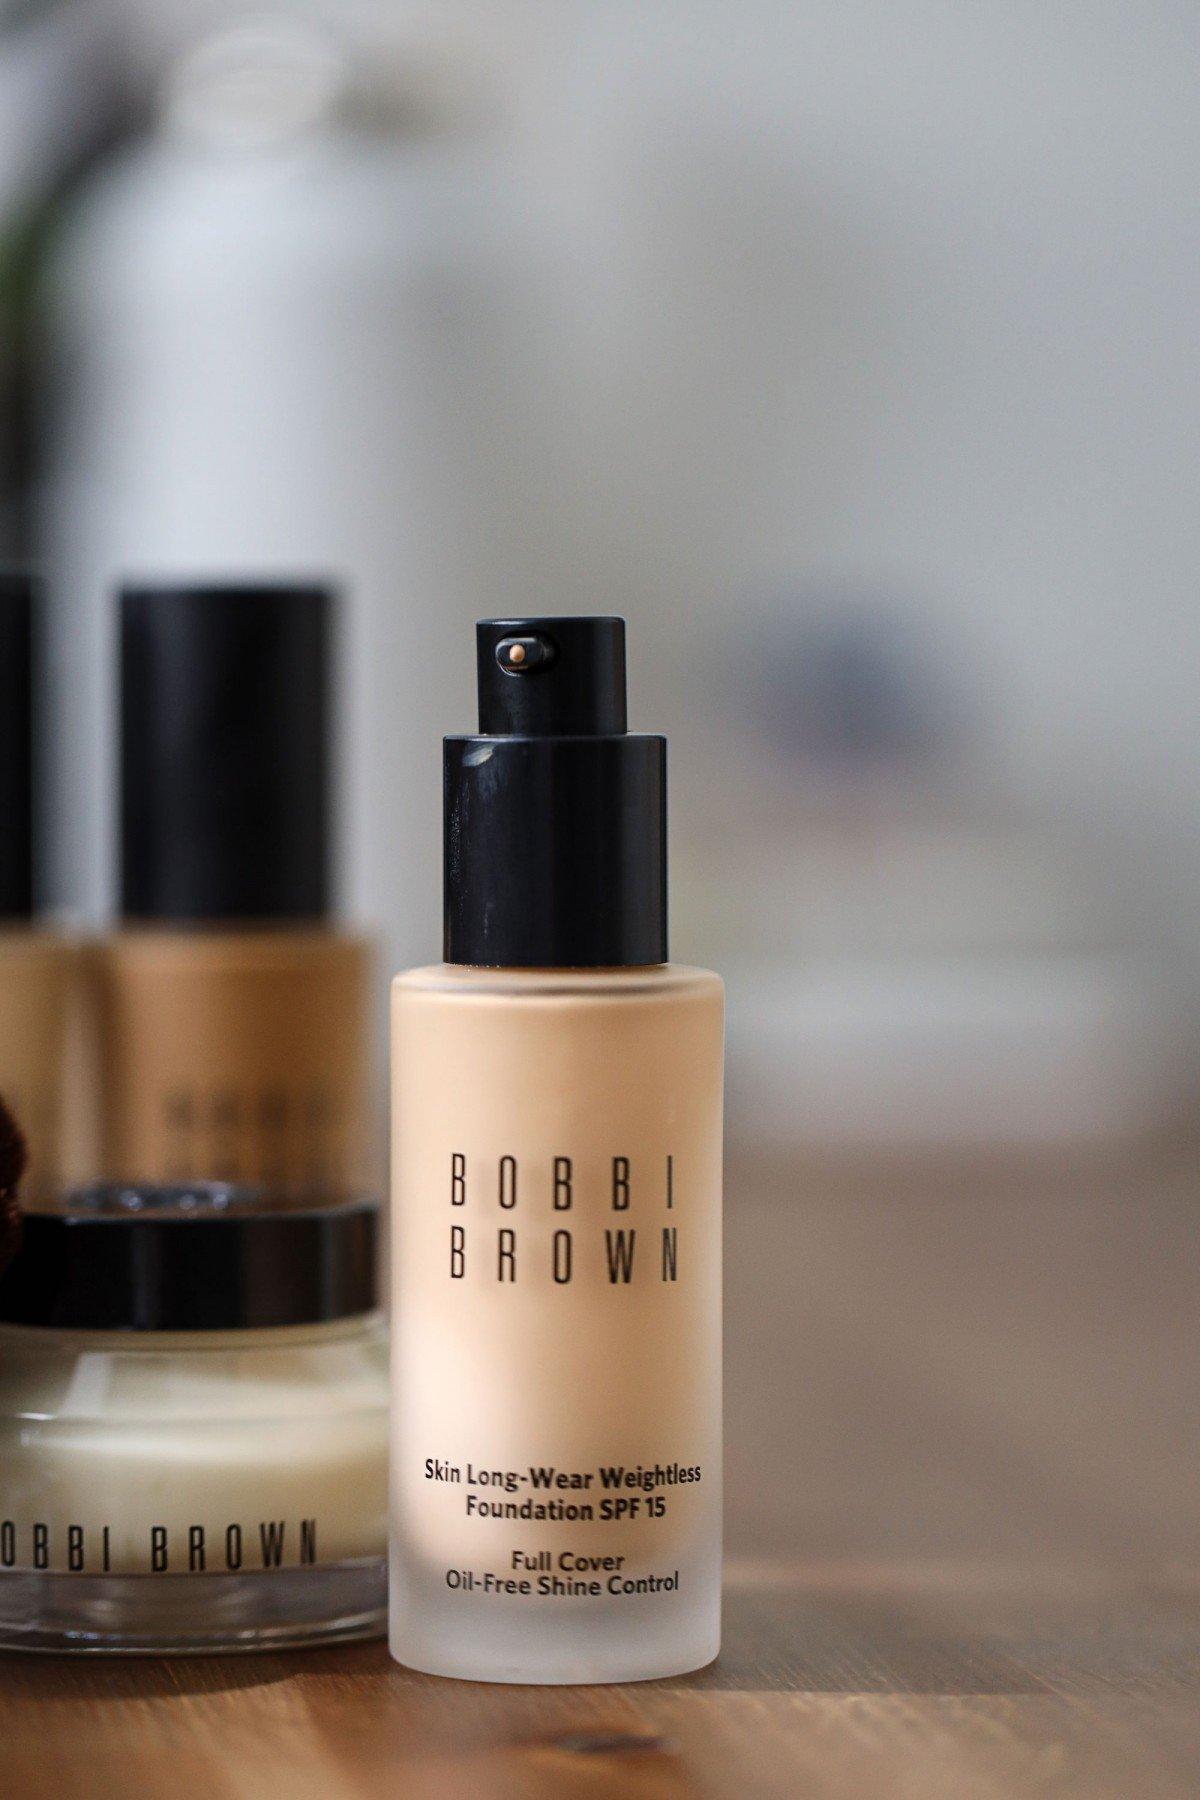 Bobbi Brown skin long-wear foundation spf 15